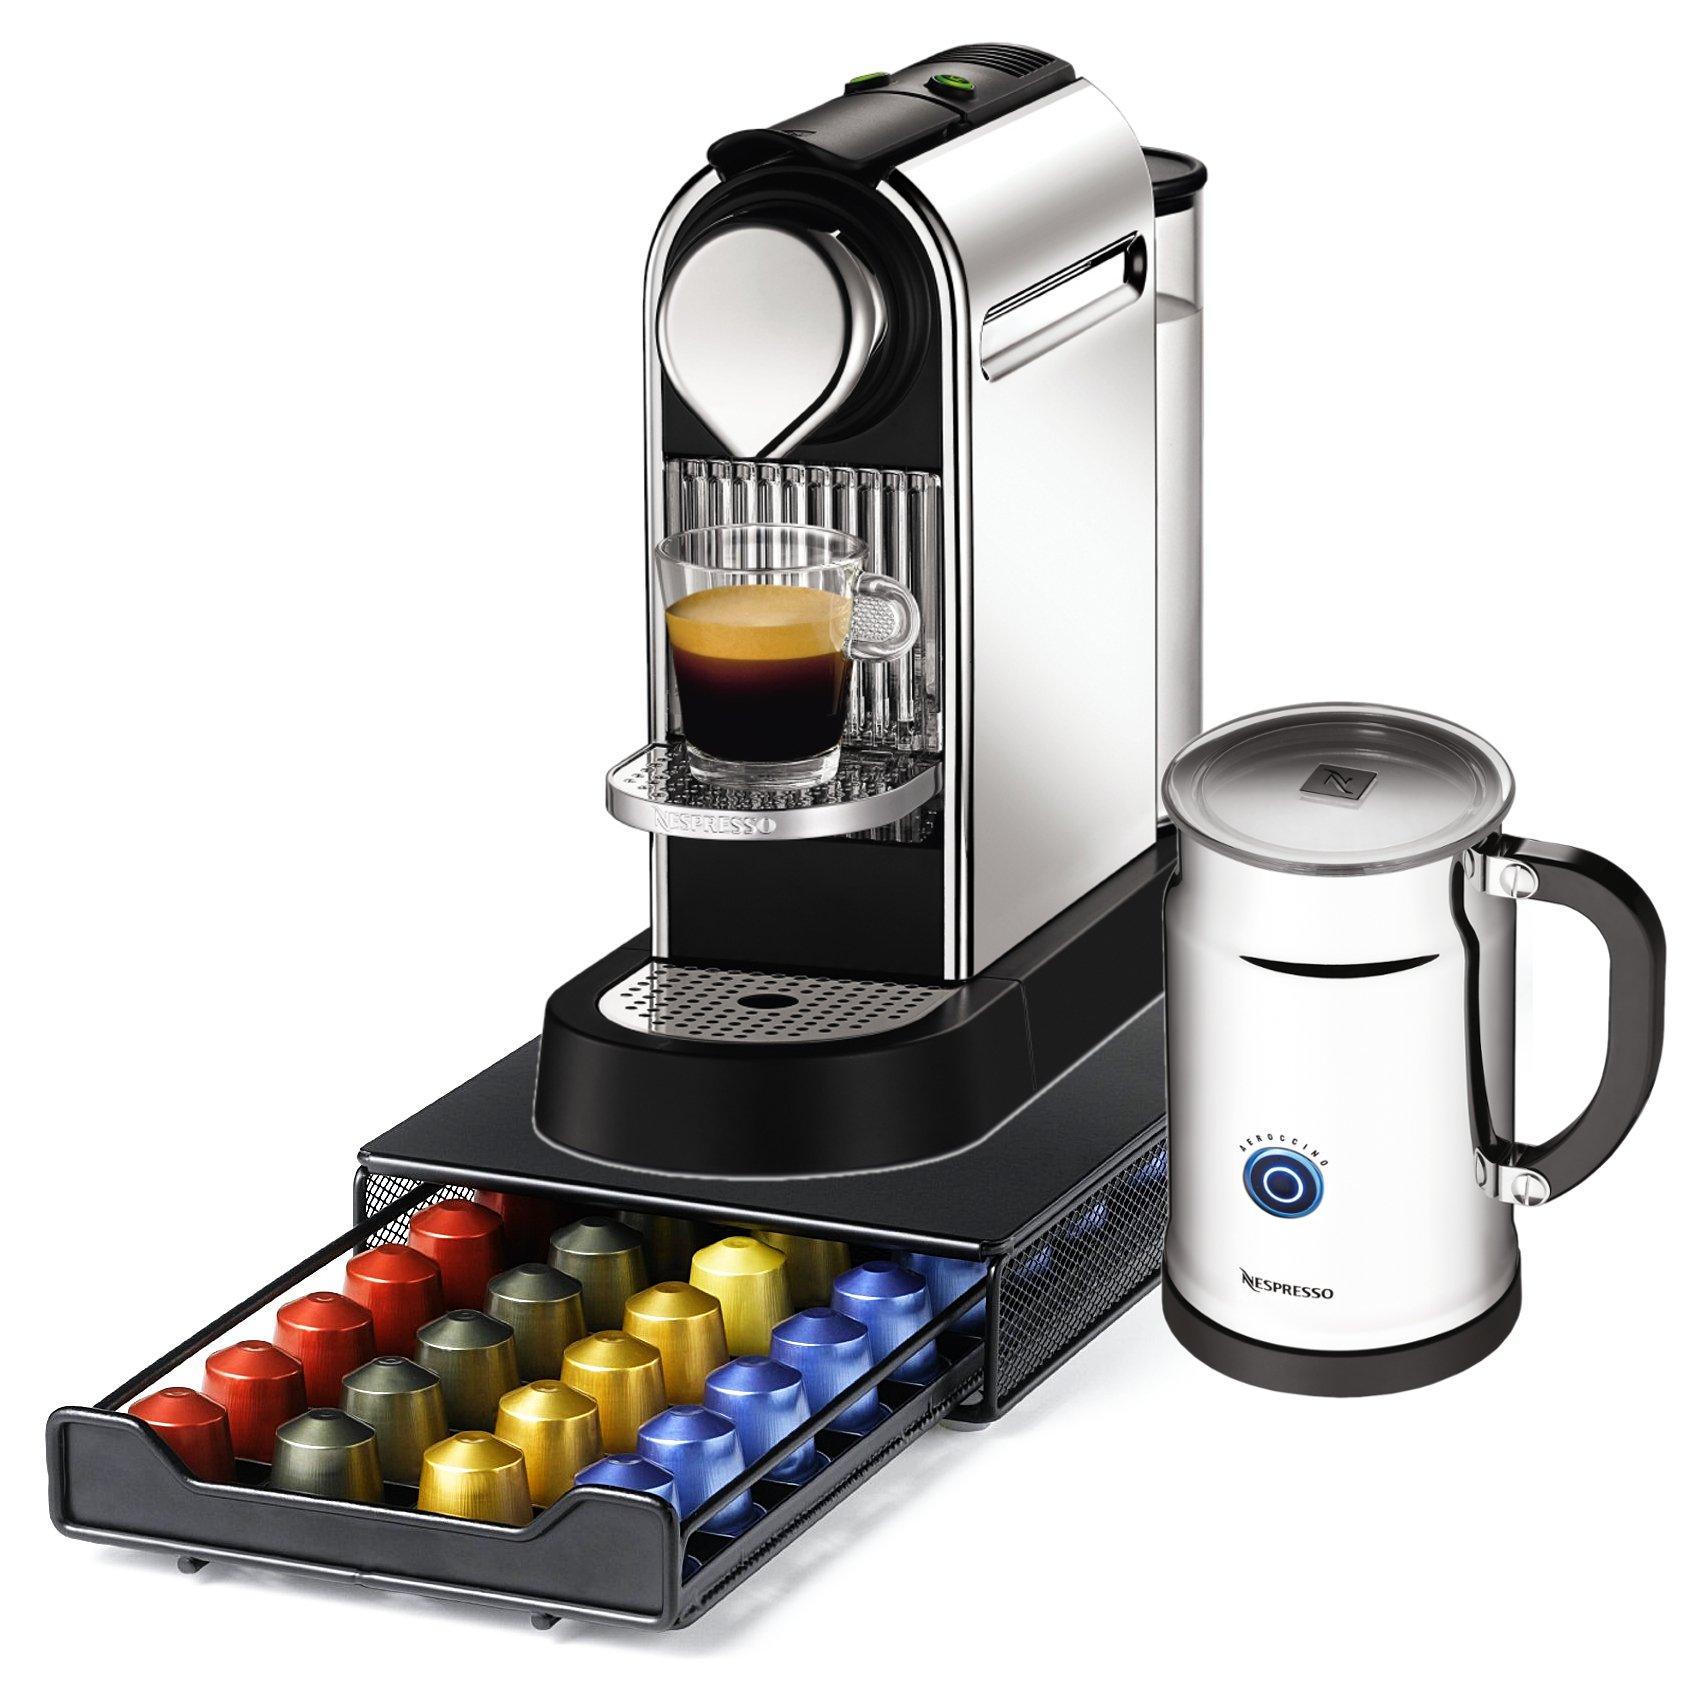 Nespresso Citiz C111 Chrome Single Serve Espresso Machine and Aeroccino Bundle and Bonus 40 Capsule Storage Drawer